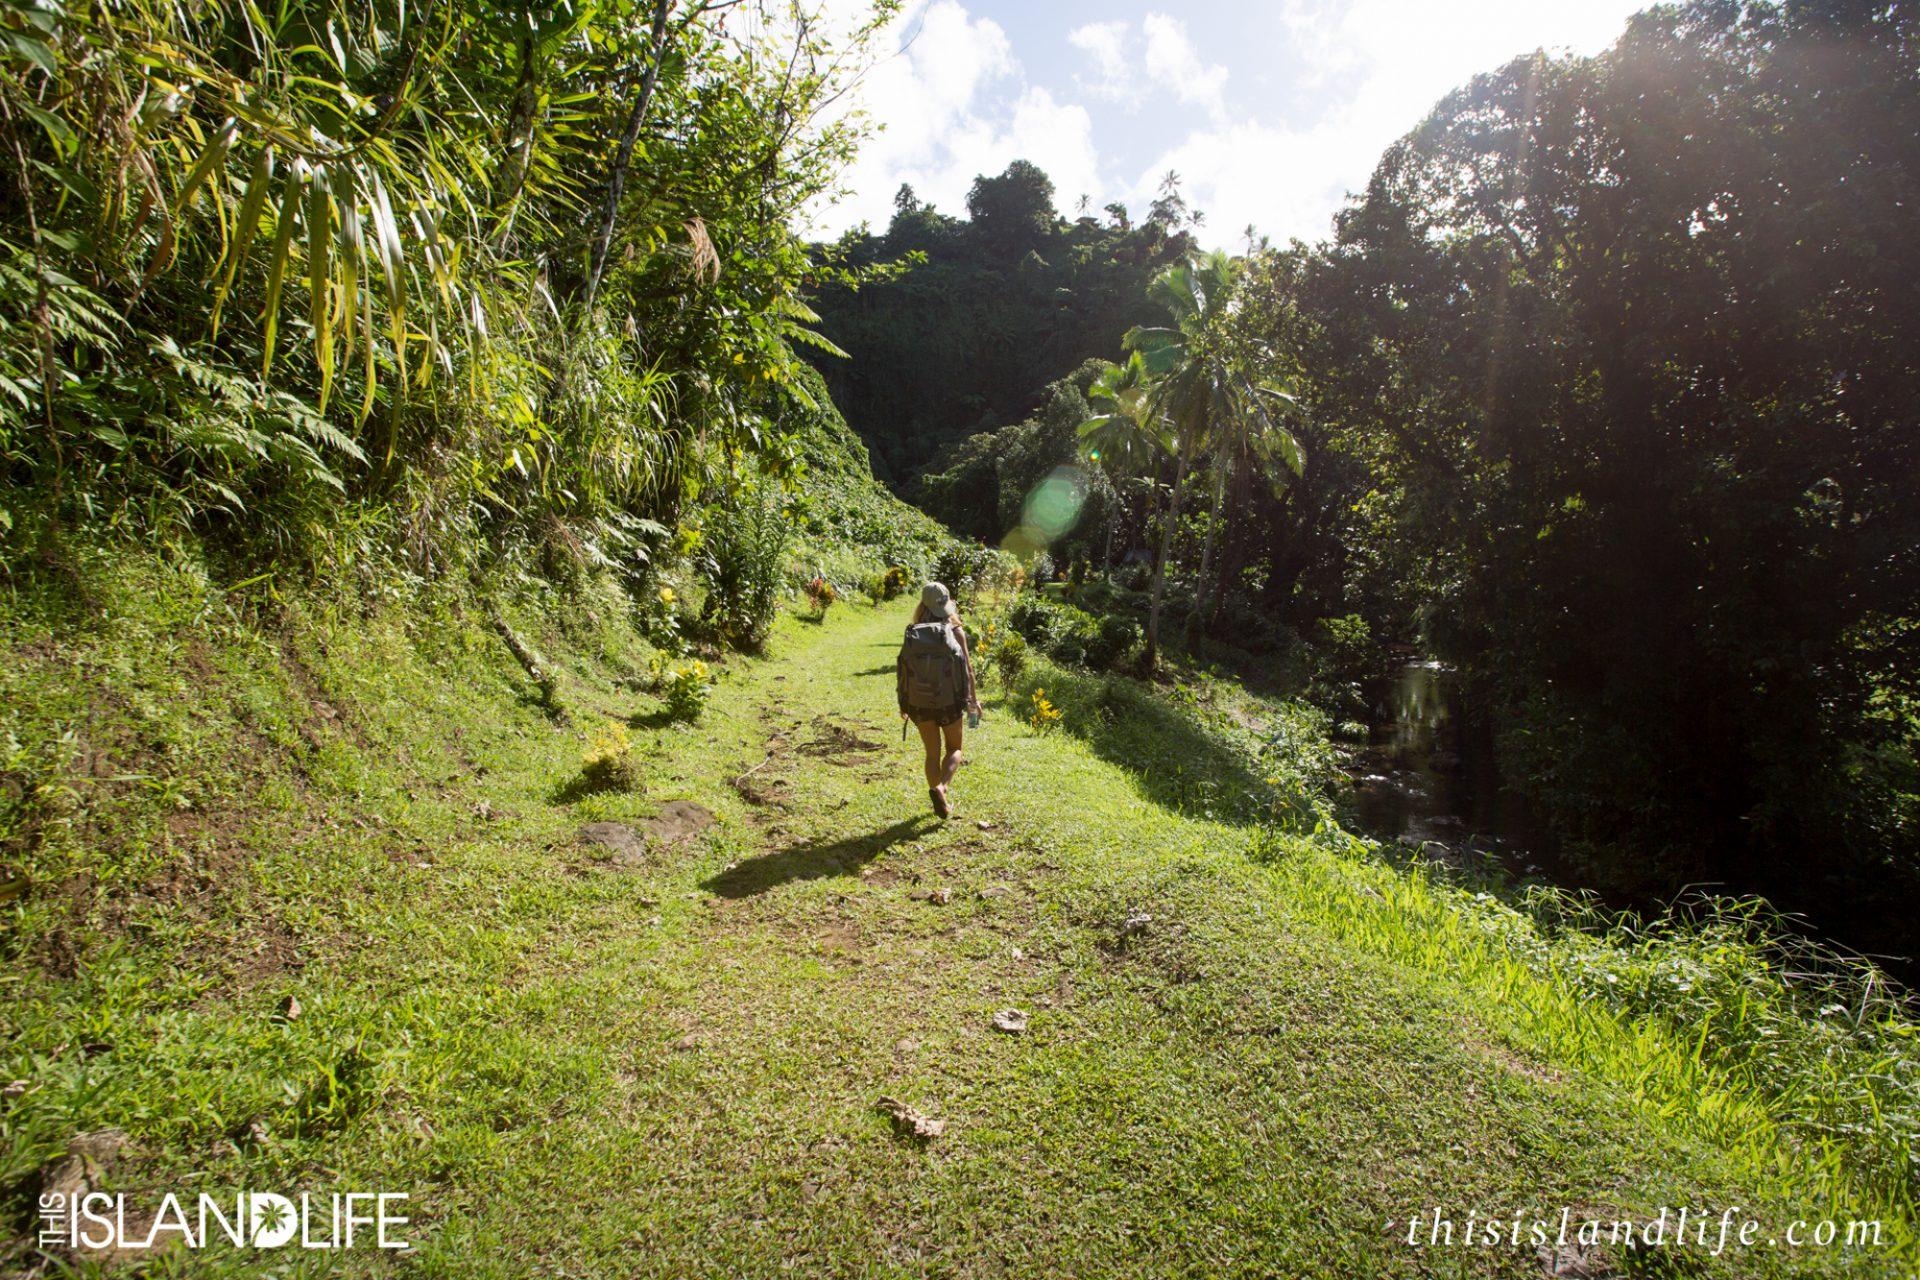 This Island Life | Michaela Skovranova | Lowepro